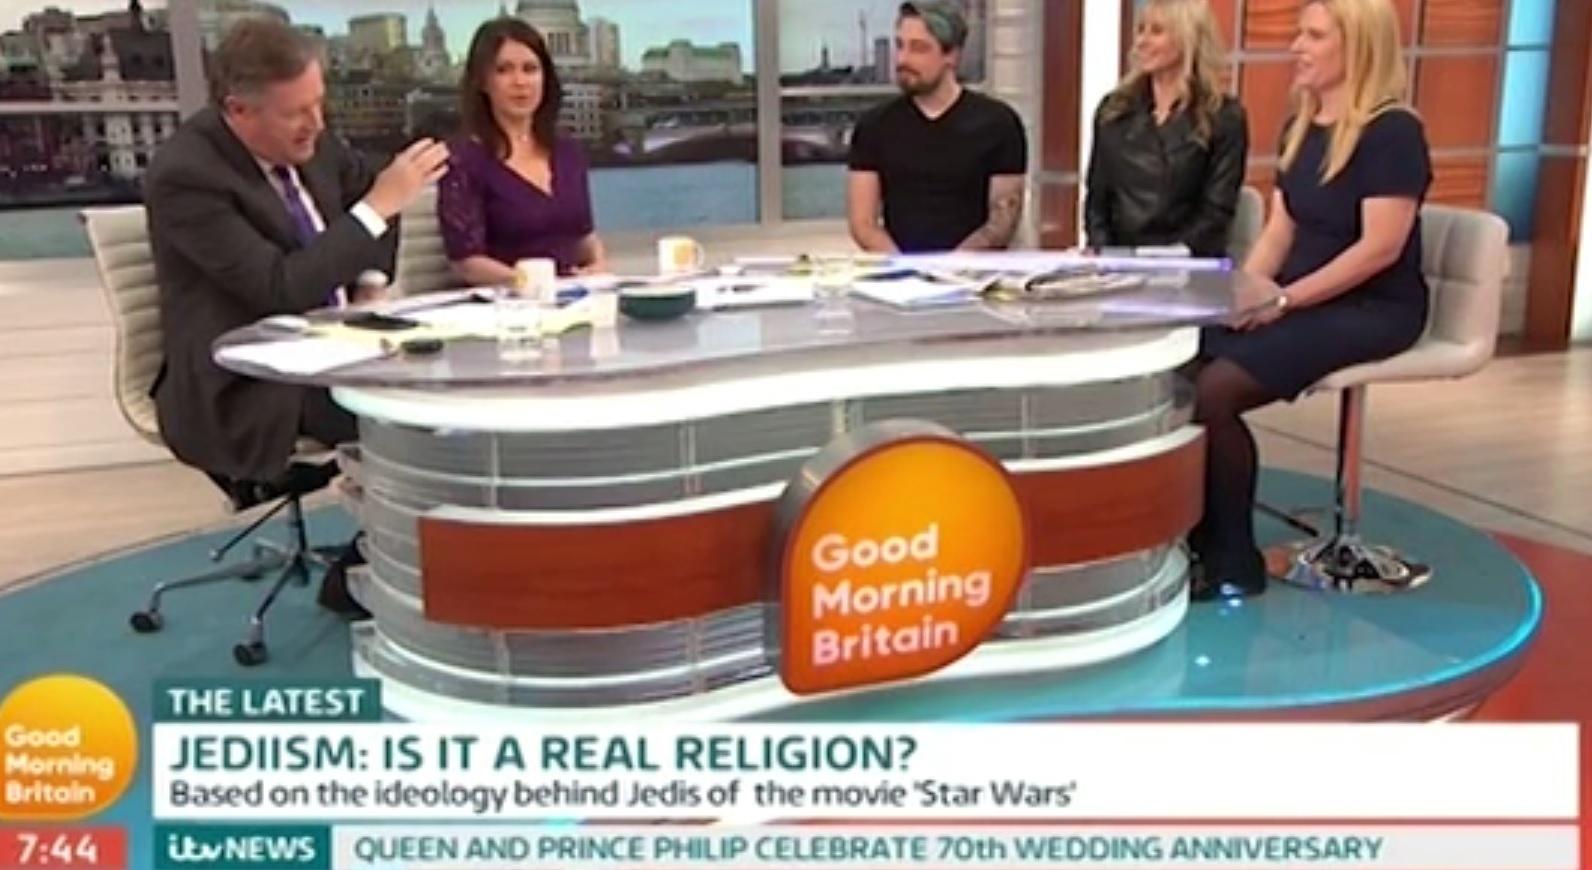 Good Morning Britain Jediism